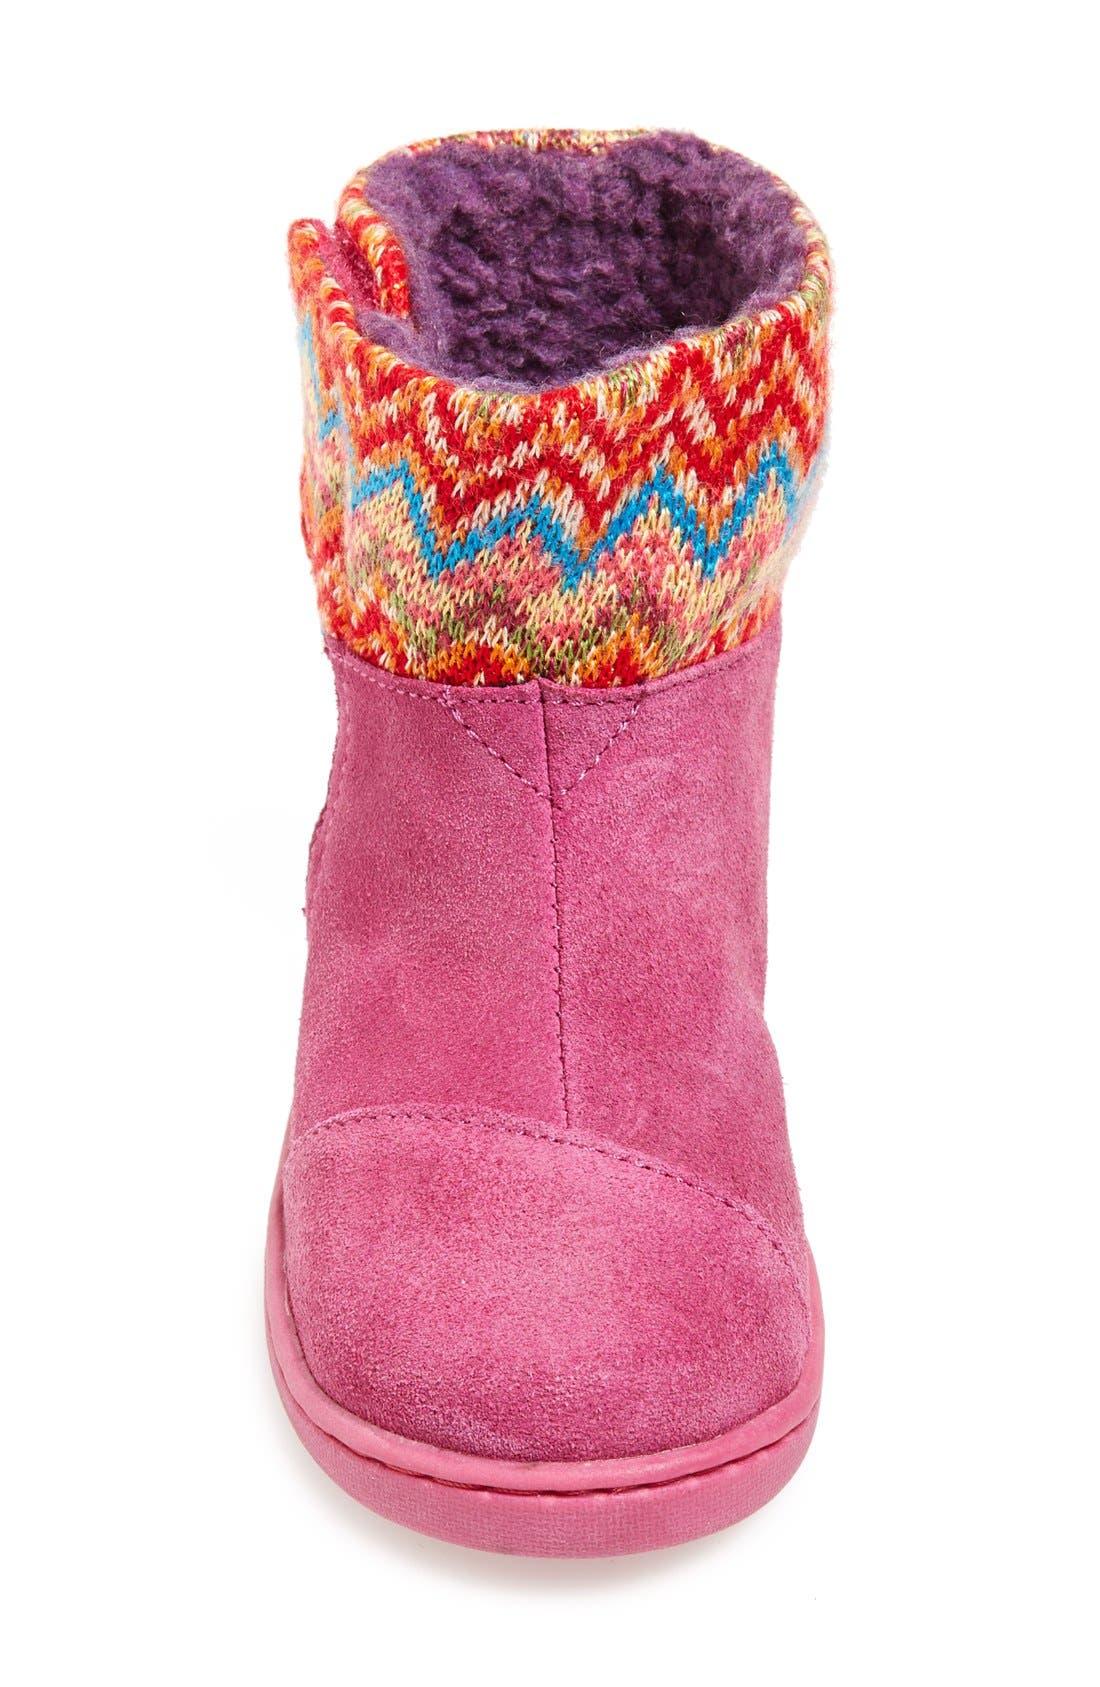 'Nepal - Tiny' Boot,                             Alternate thumbnail 3, color,                             Pink Multi Zigzag